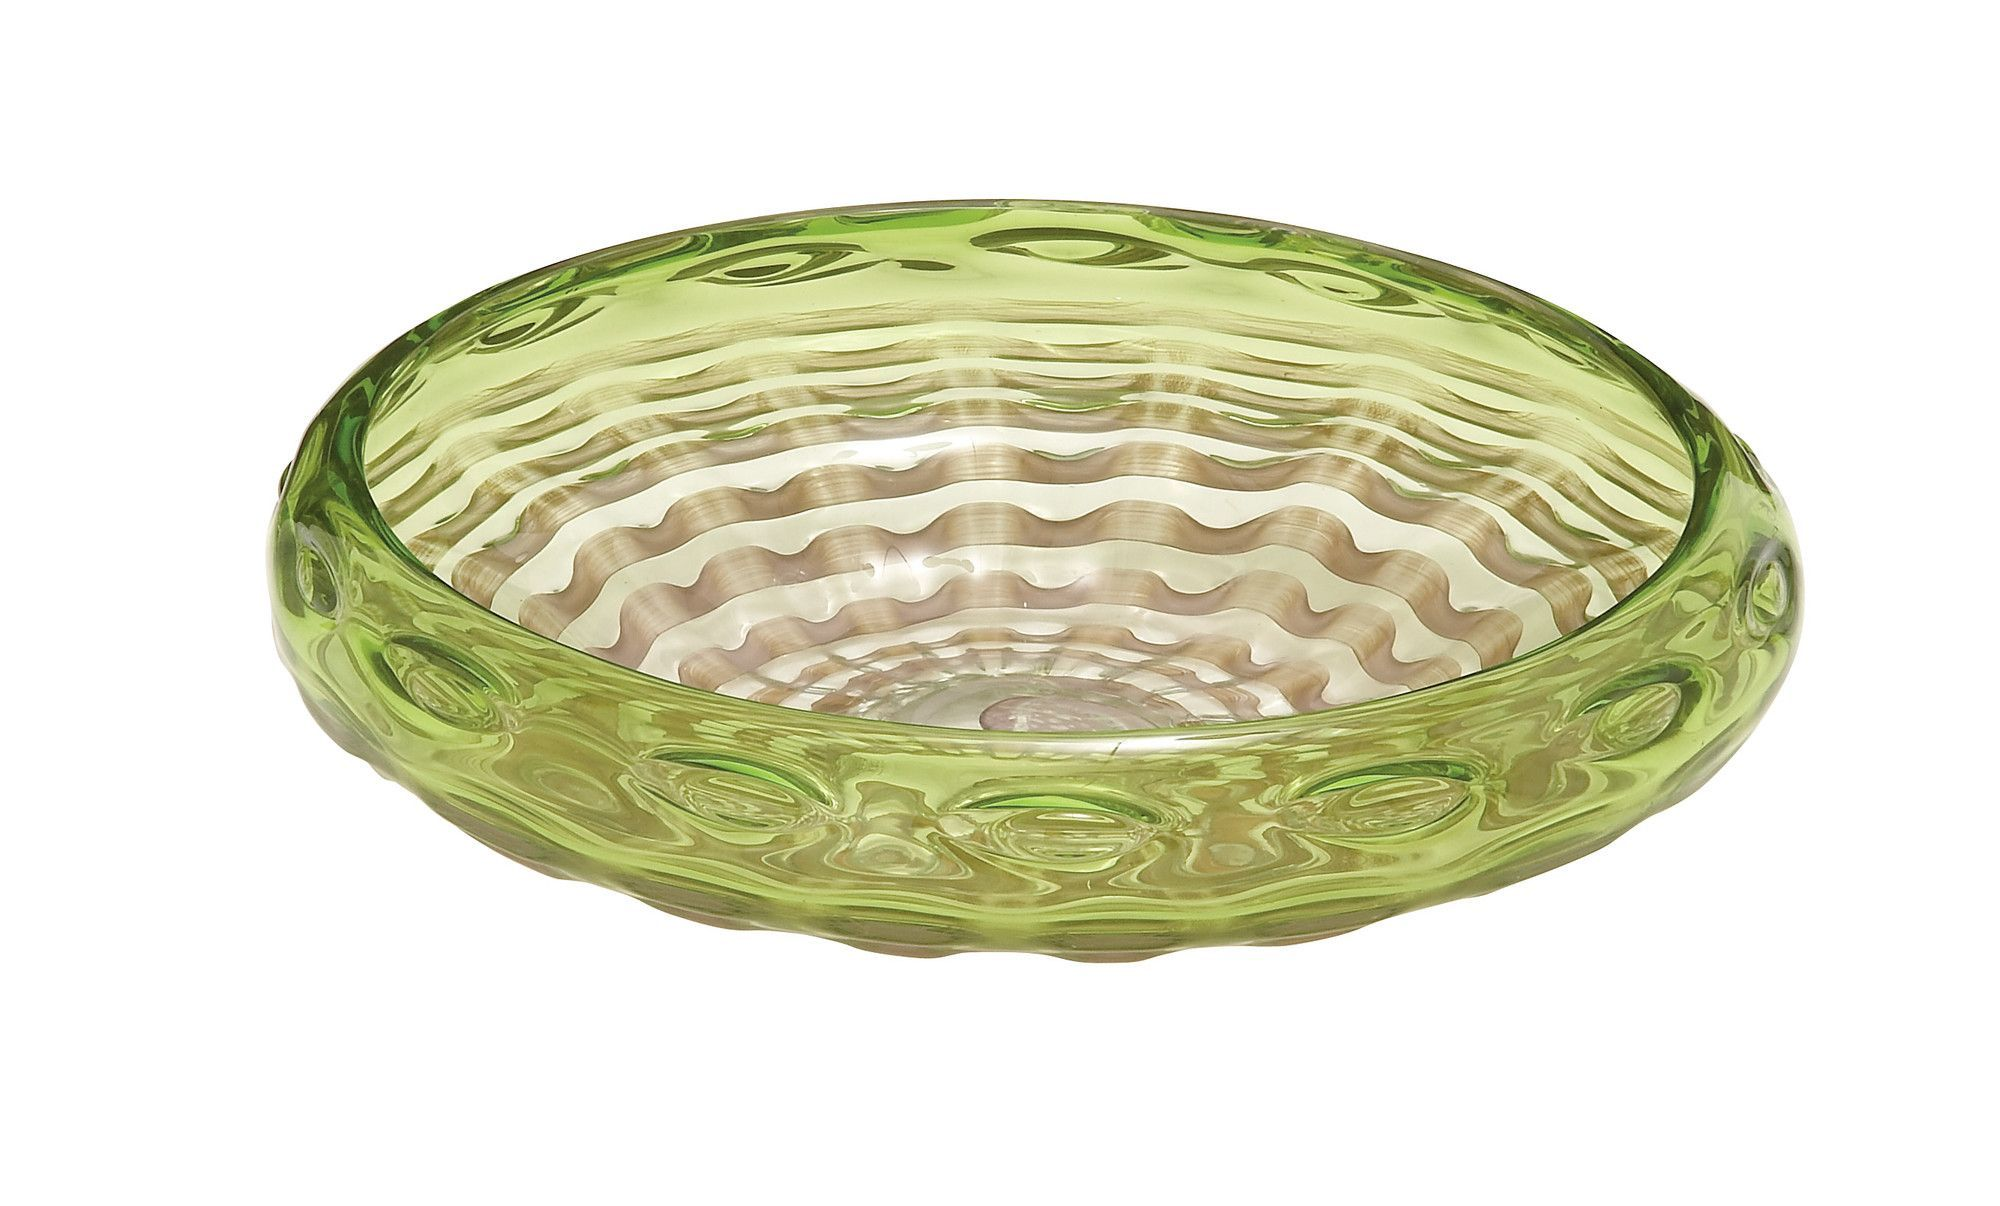 Customary Styled Glass Decorative Bowl Decorative Bowls Green Bowl Bowl